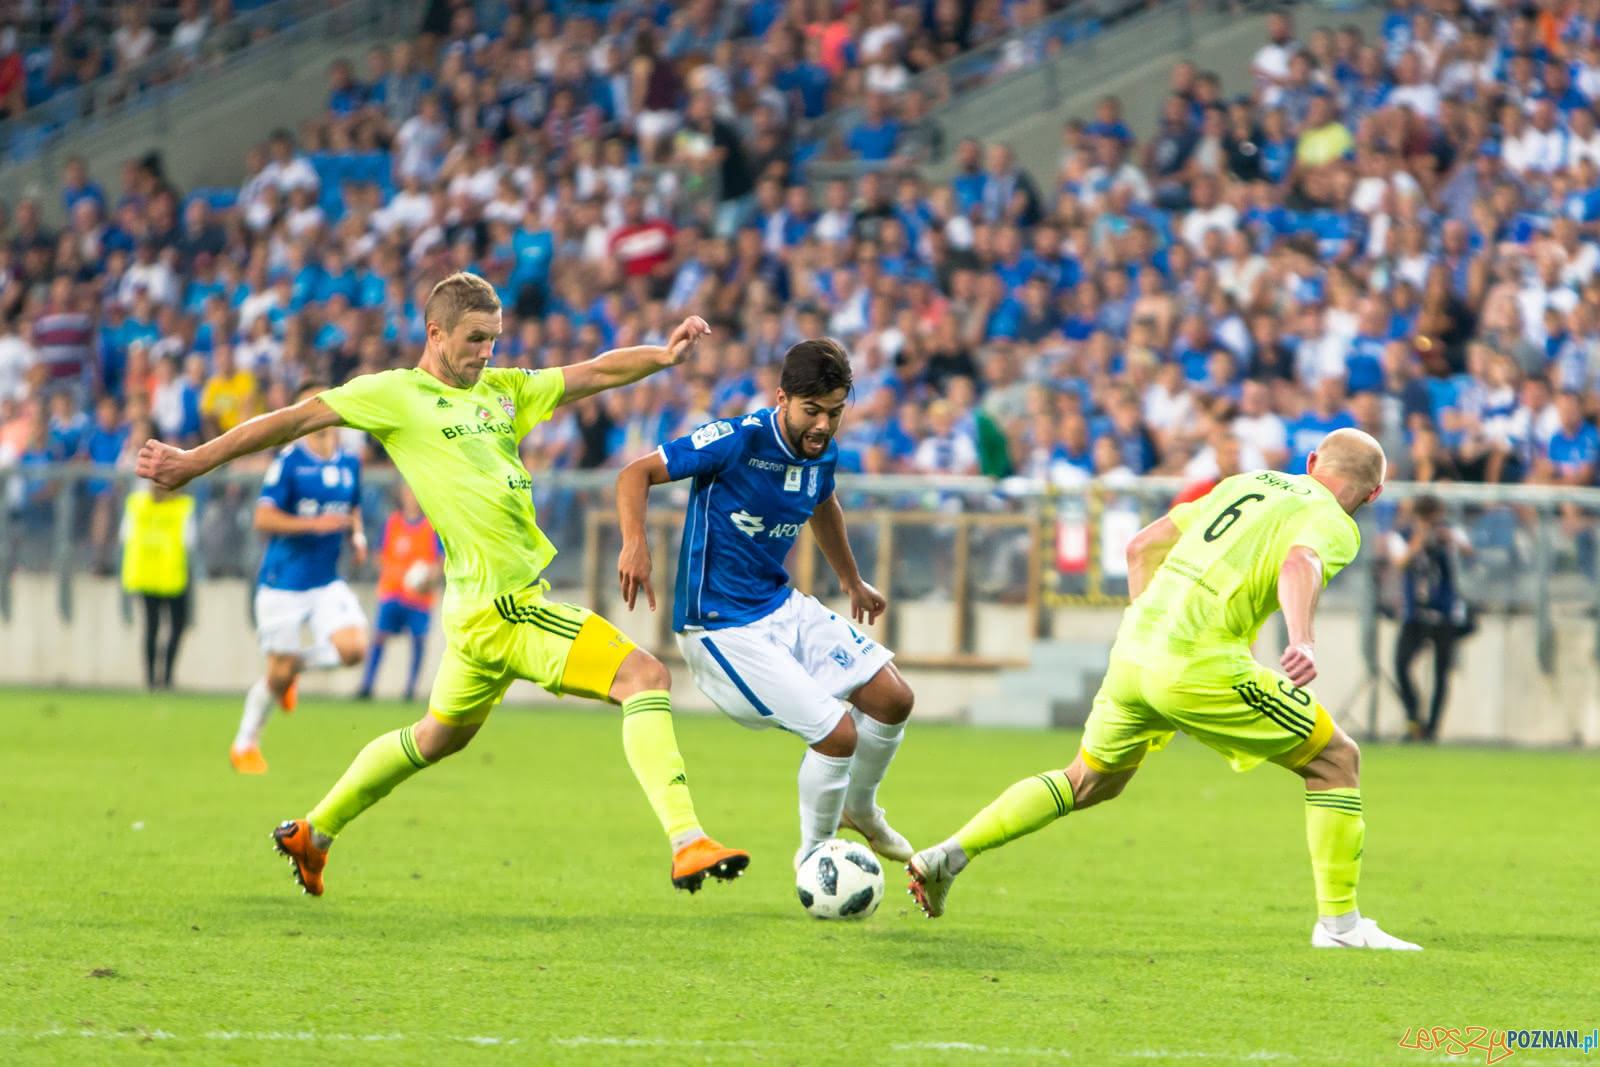 Lech Poznań - FC Shakhtyor Soligorsk (Joao pedro Reis Amaral, I  Foto: lepszyPOZNAN.pl/Piotr Rychter